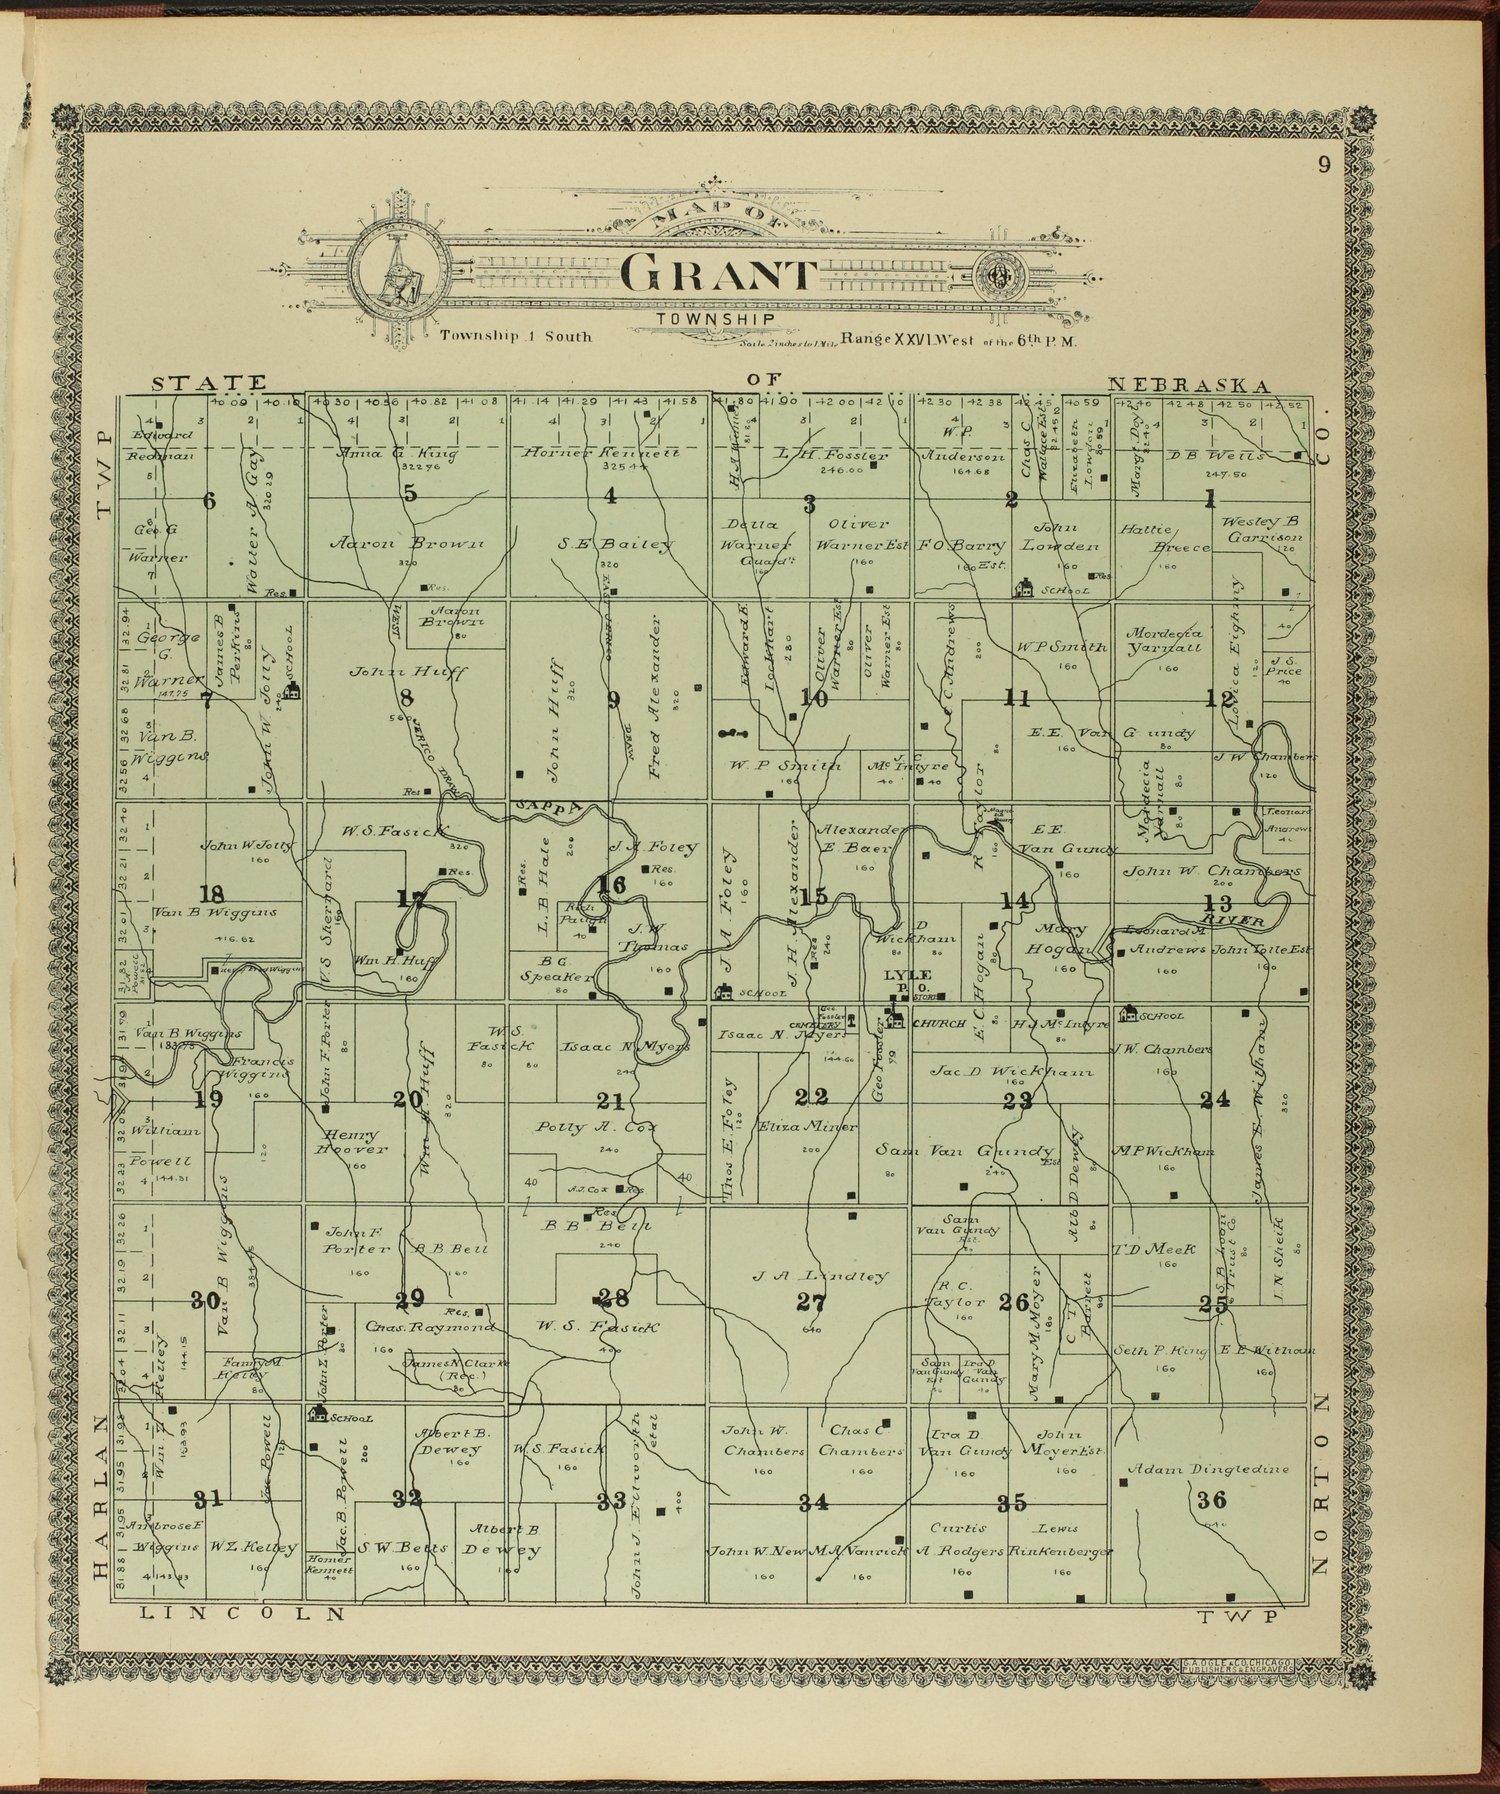 Standard atlas of Decatur County, Kansas - 9